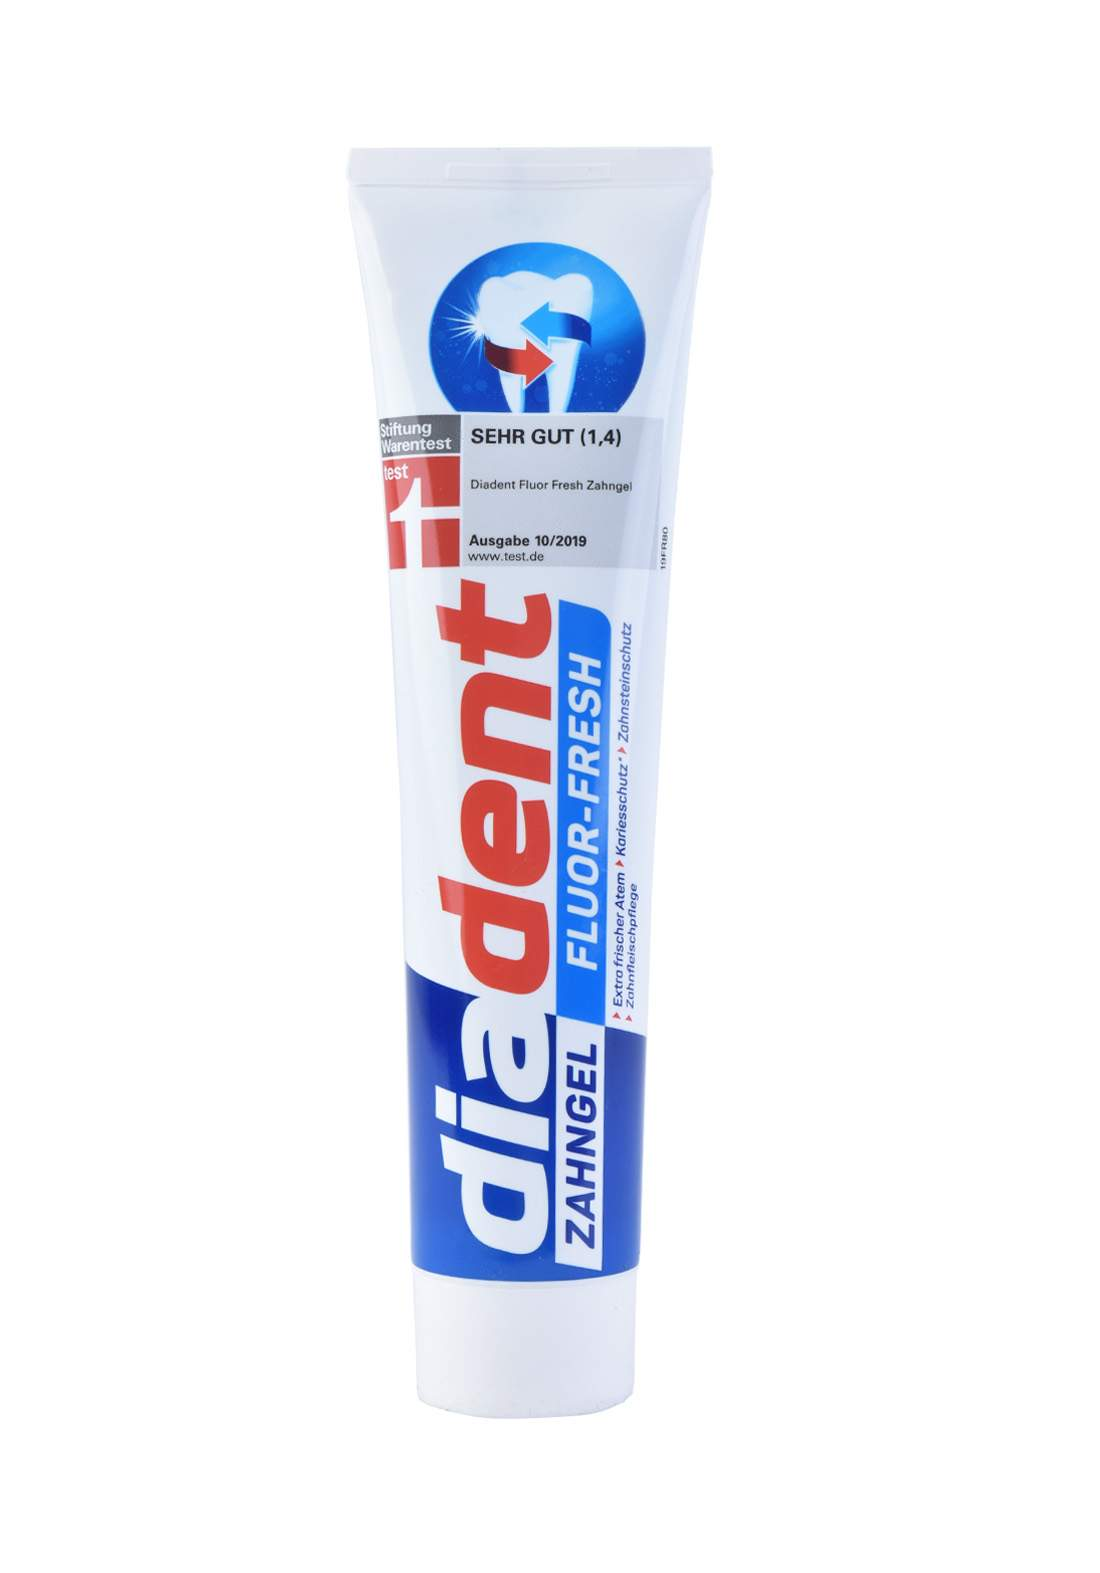 Diadent Fluor Fresh Zahngel 125ml معجون اسنان (الماني اصلي)